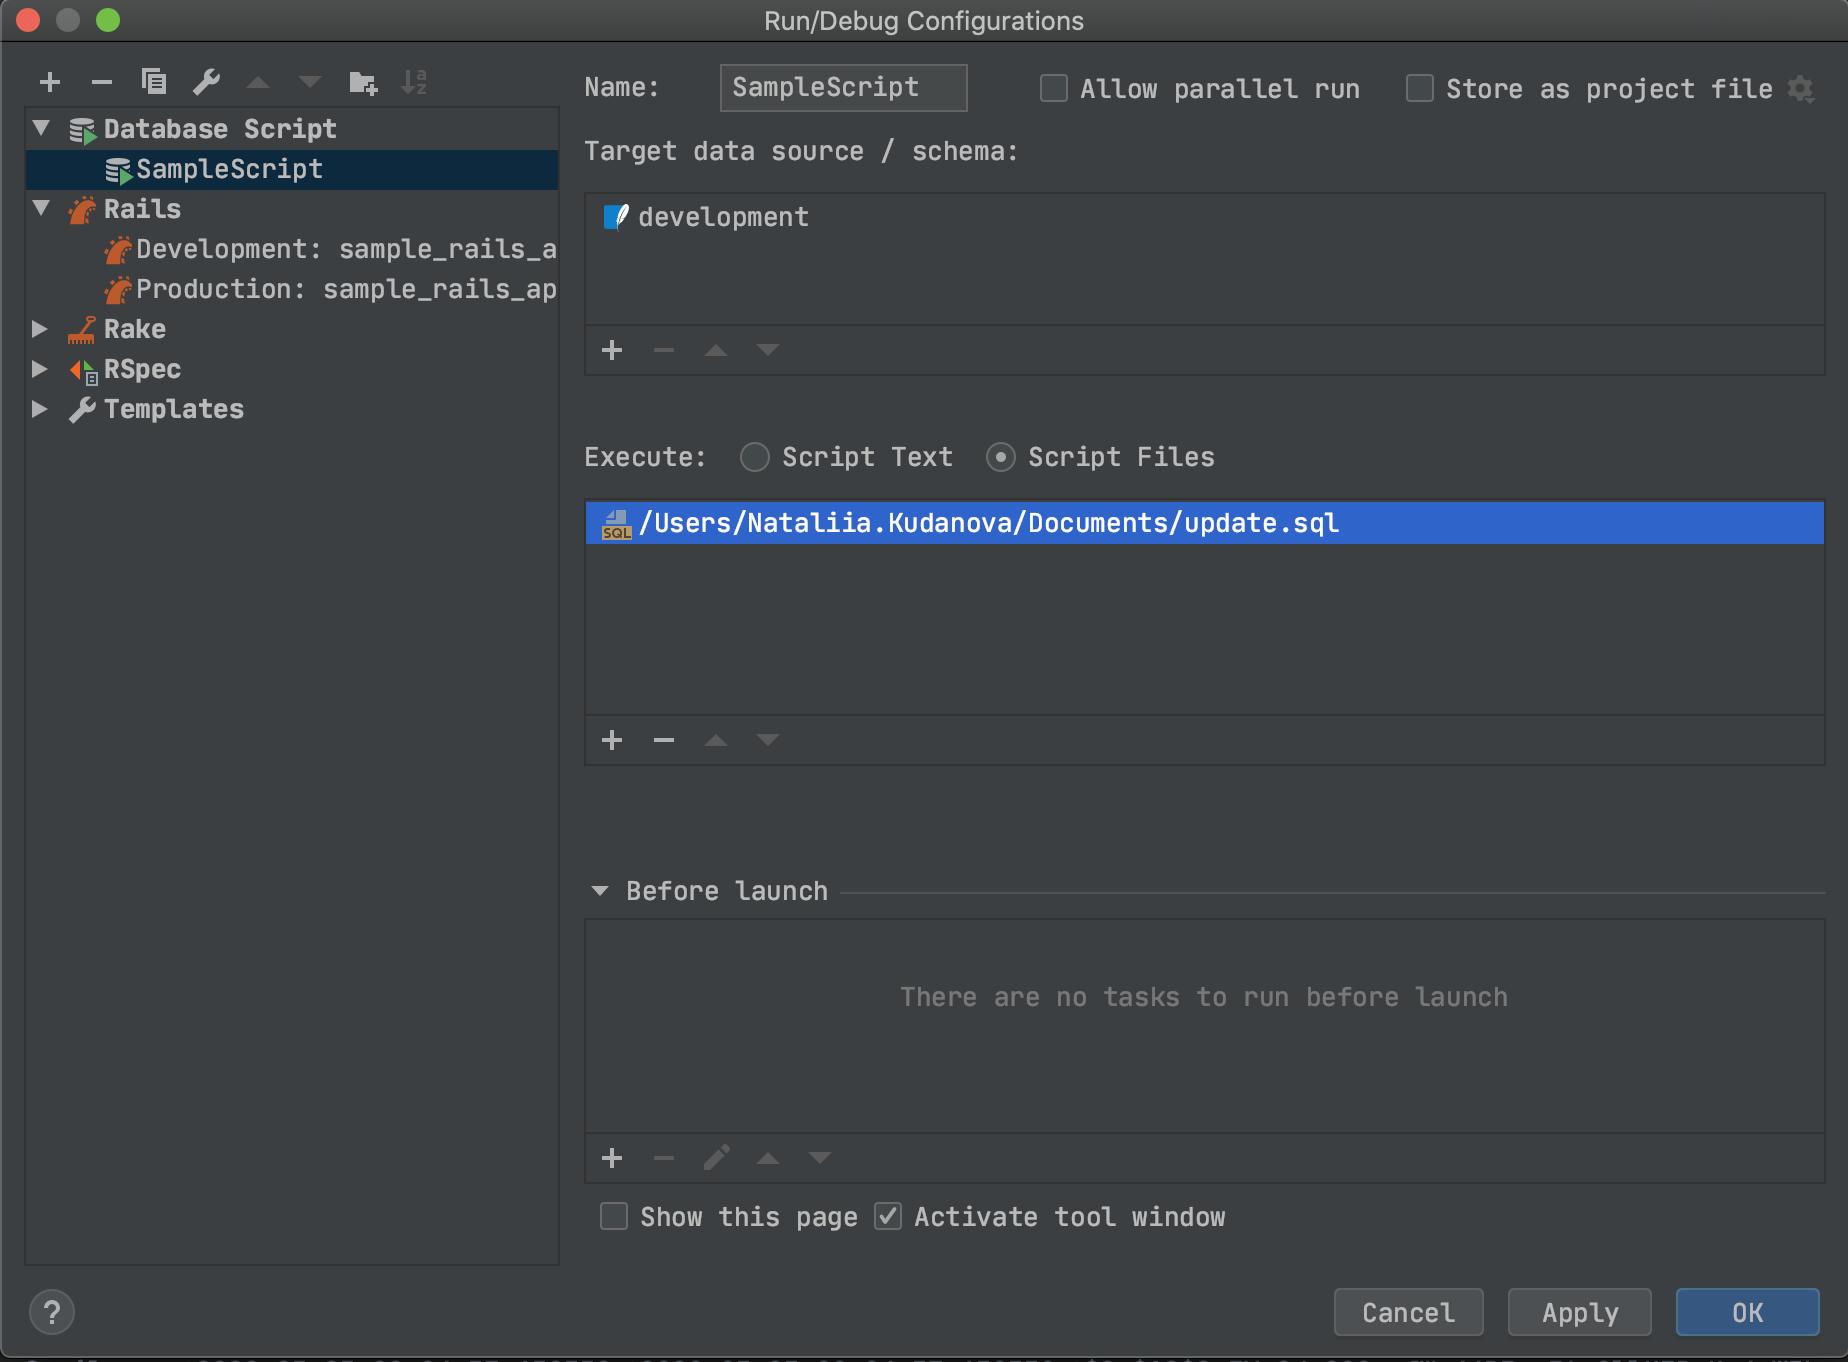 DB scripts in run configurations